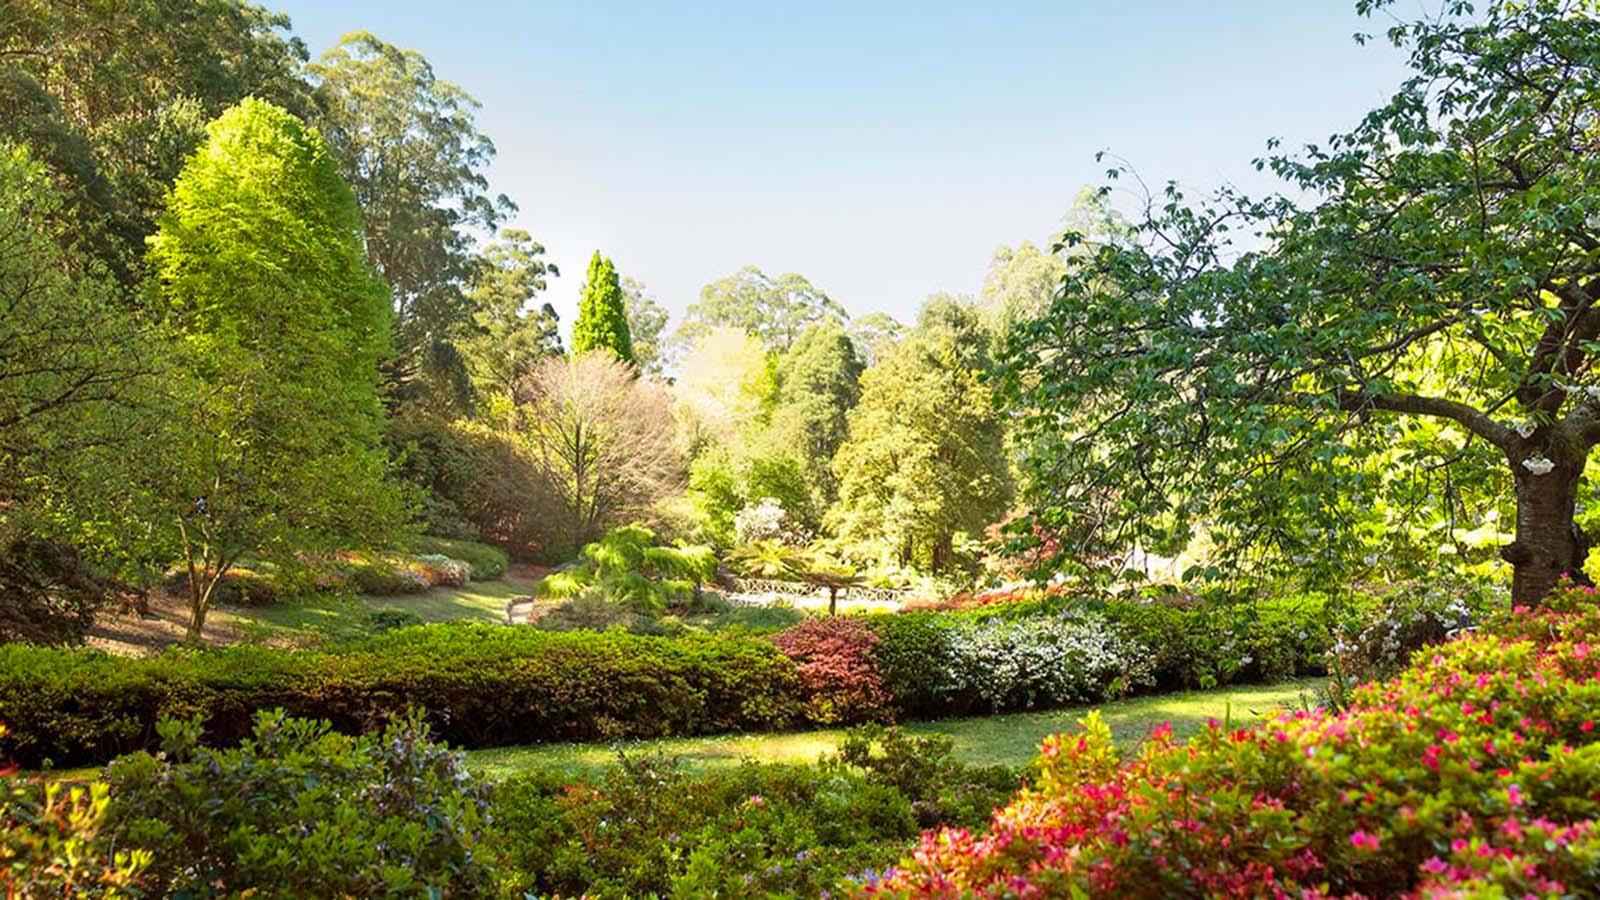 National Rhododendron Gardens, Yarra Valley & Dandenong Ranges, Victoria, Australia